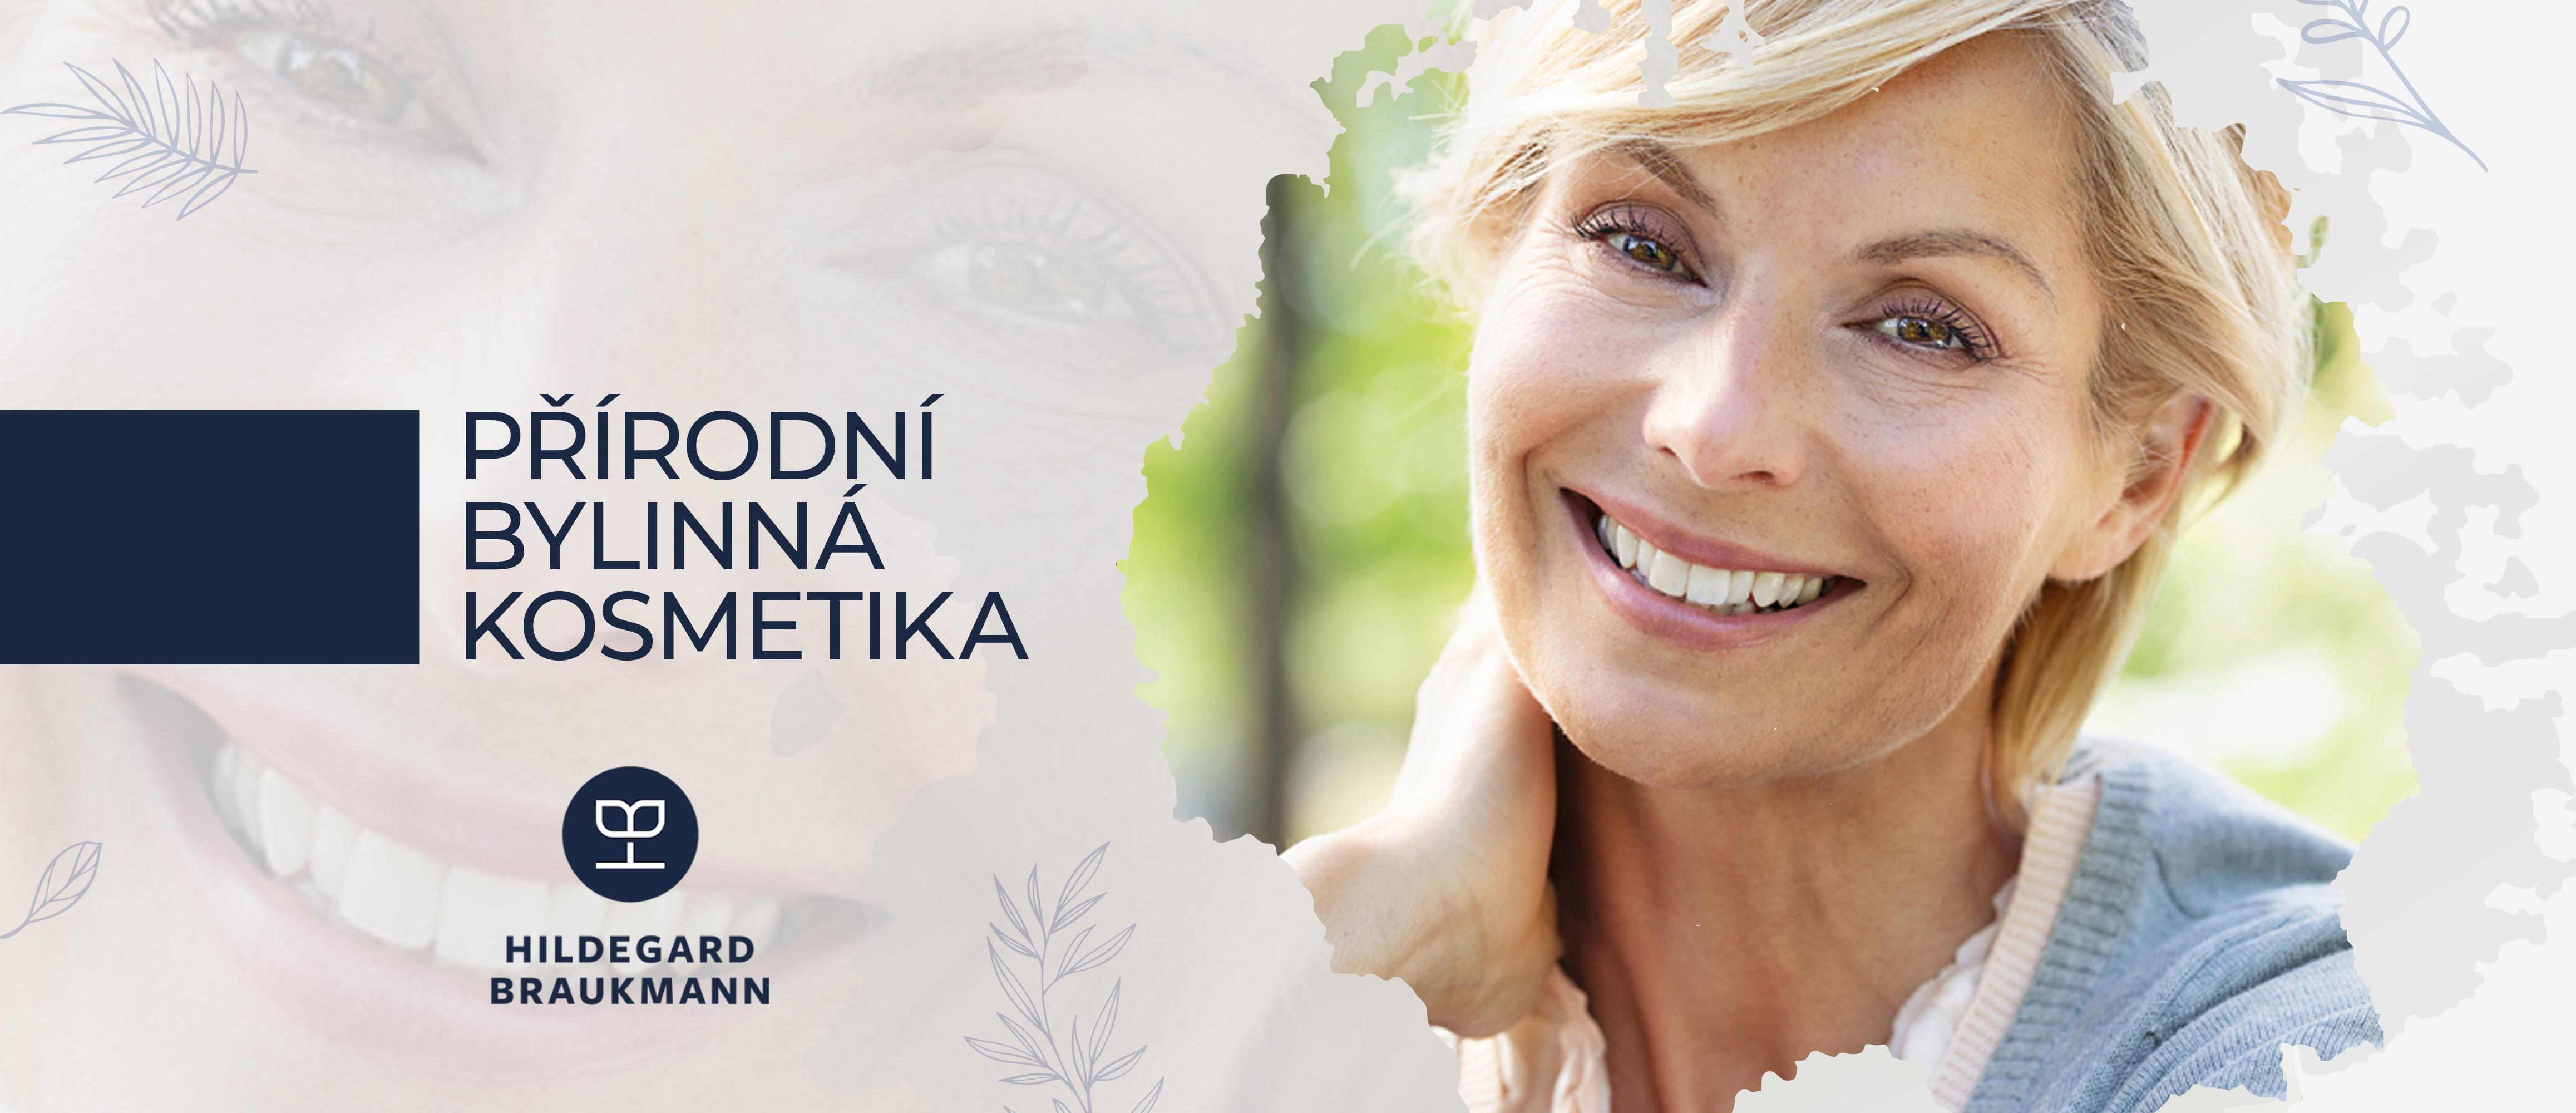 Přírodní bylinná kosmetika Hildegard Braukmann